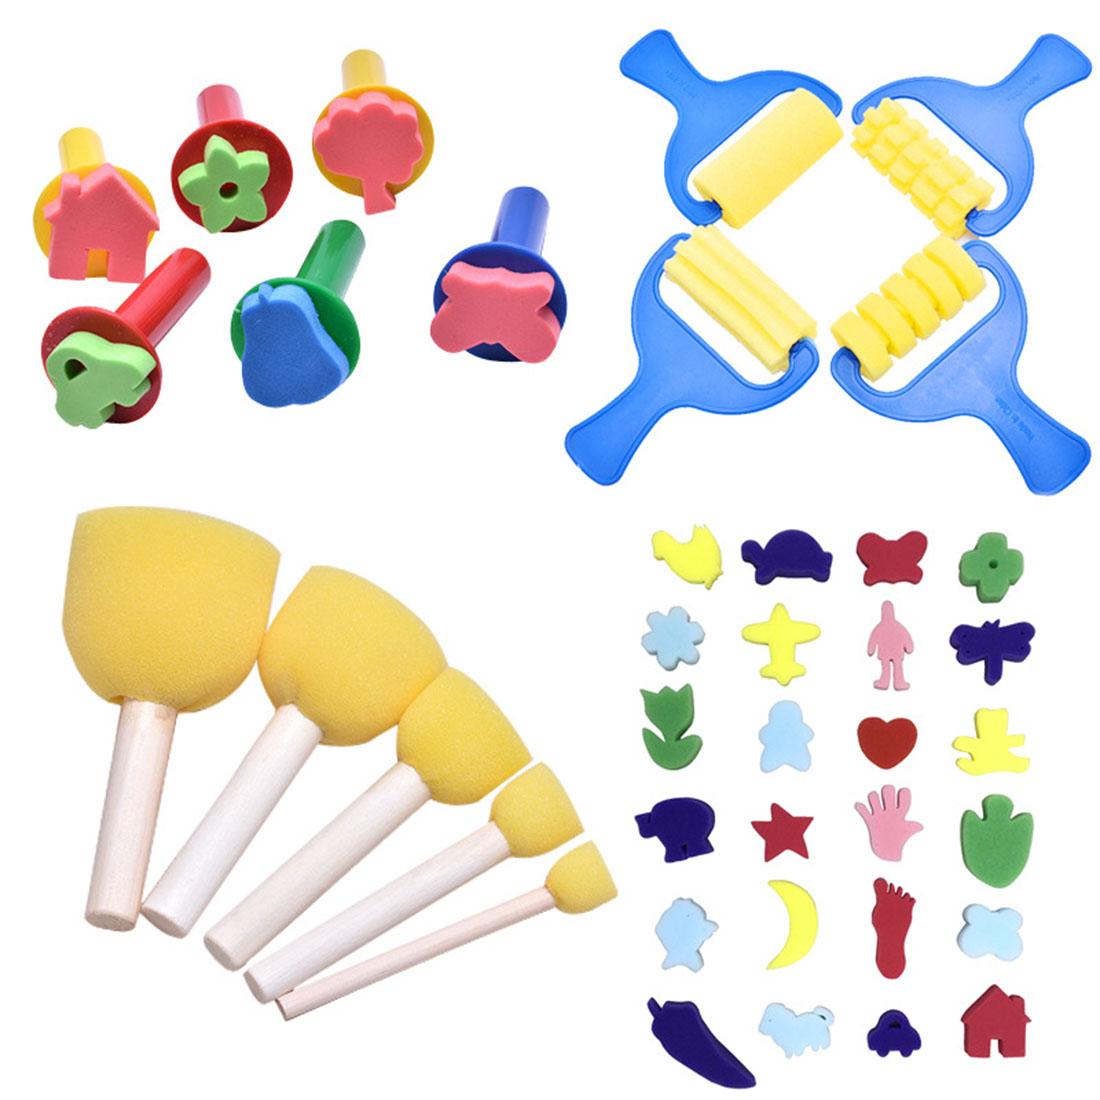 39pcs/set Kids Painting Tools Sponge Paint Roller Brushes DIY Children Early Learning Toys Kids Drawing Toys Art Graffiti Tool